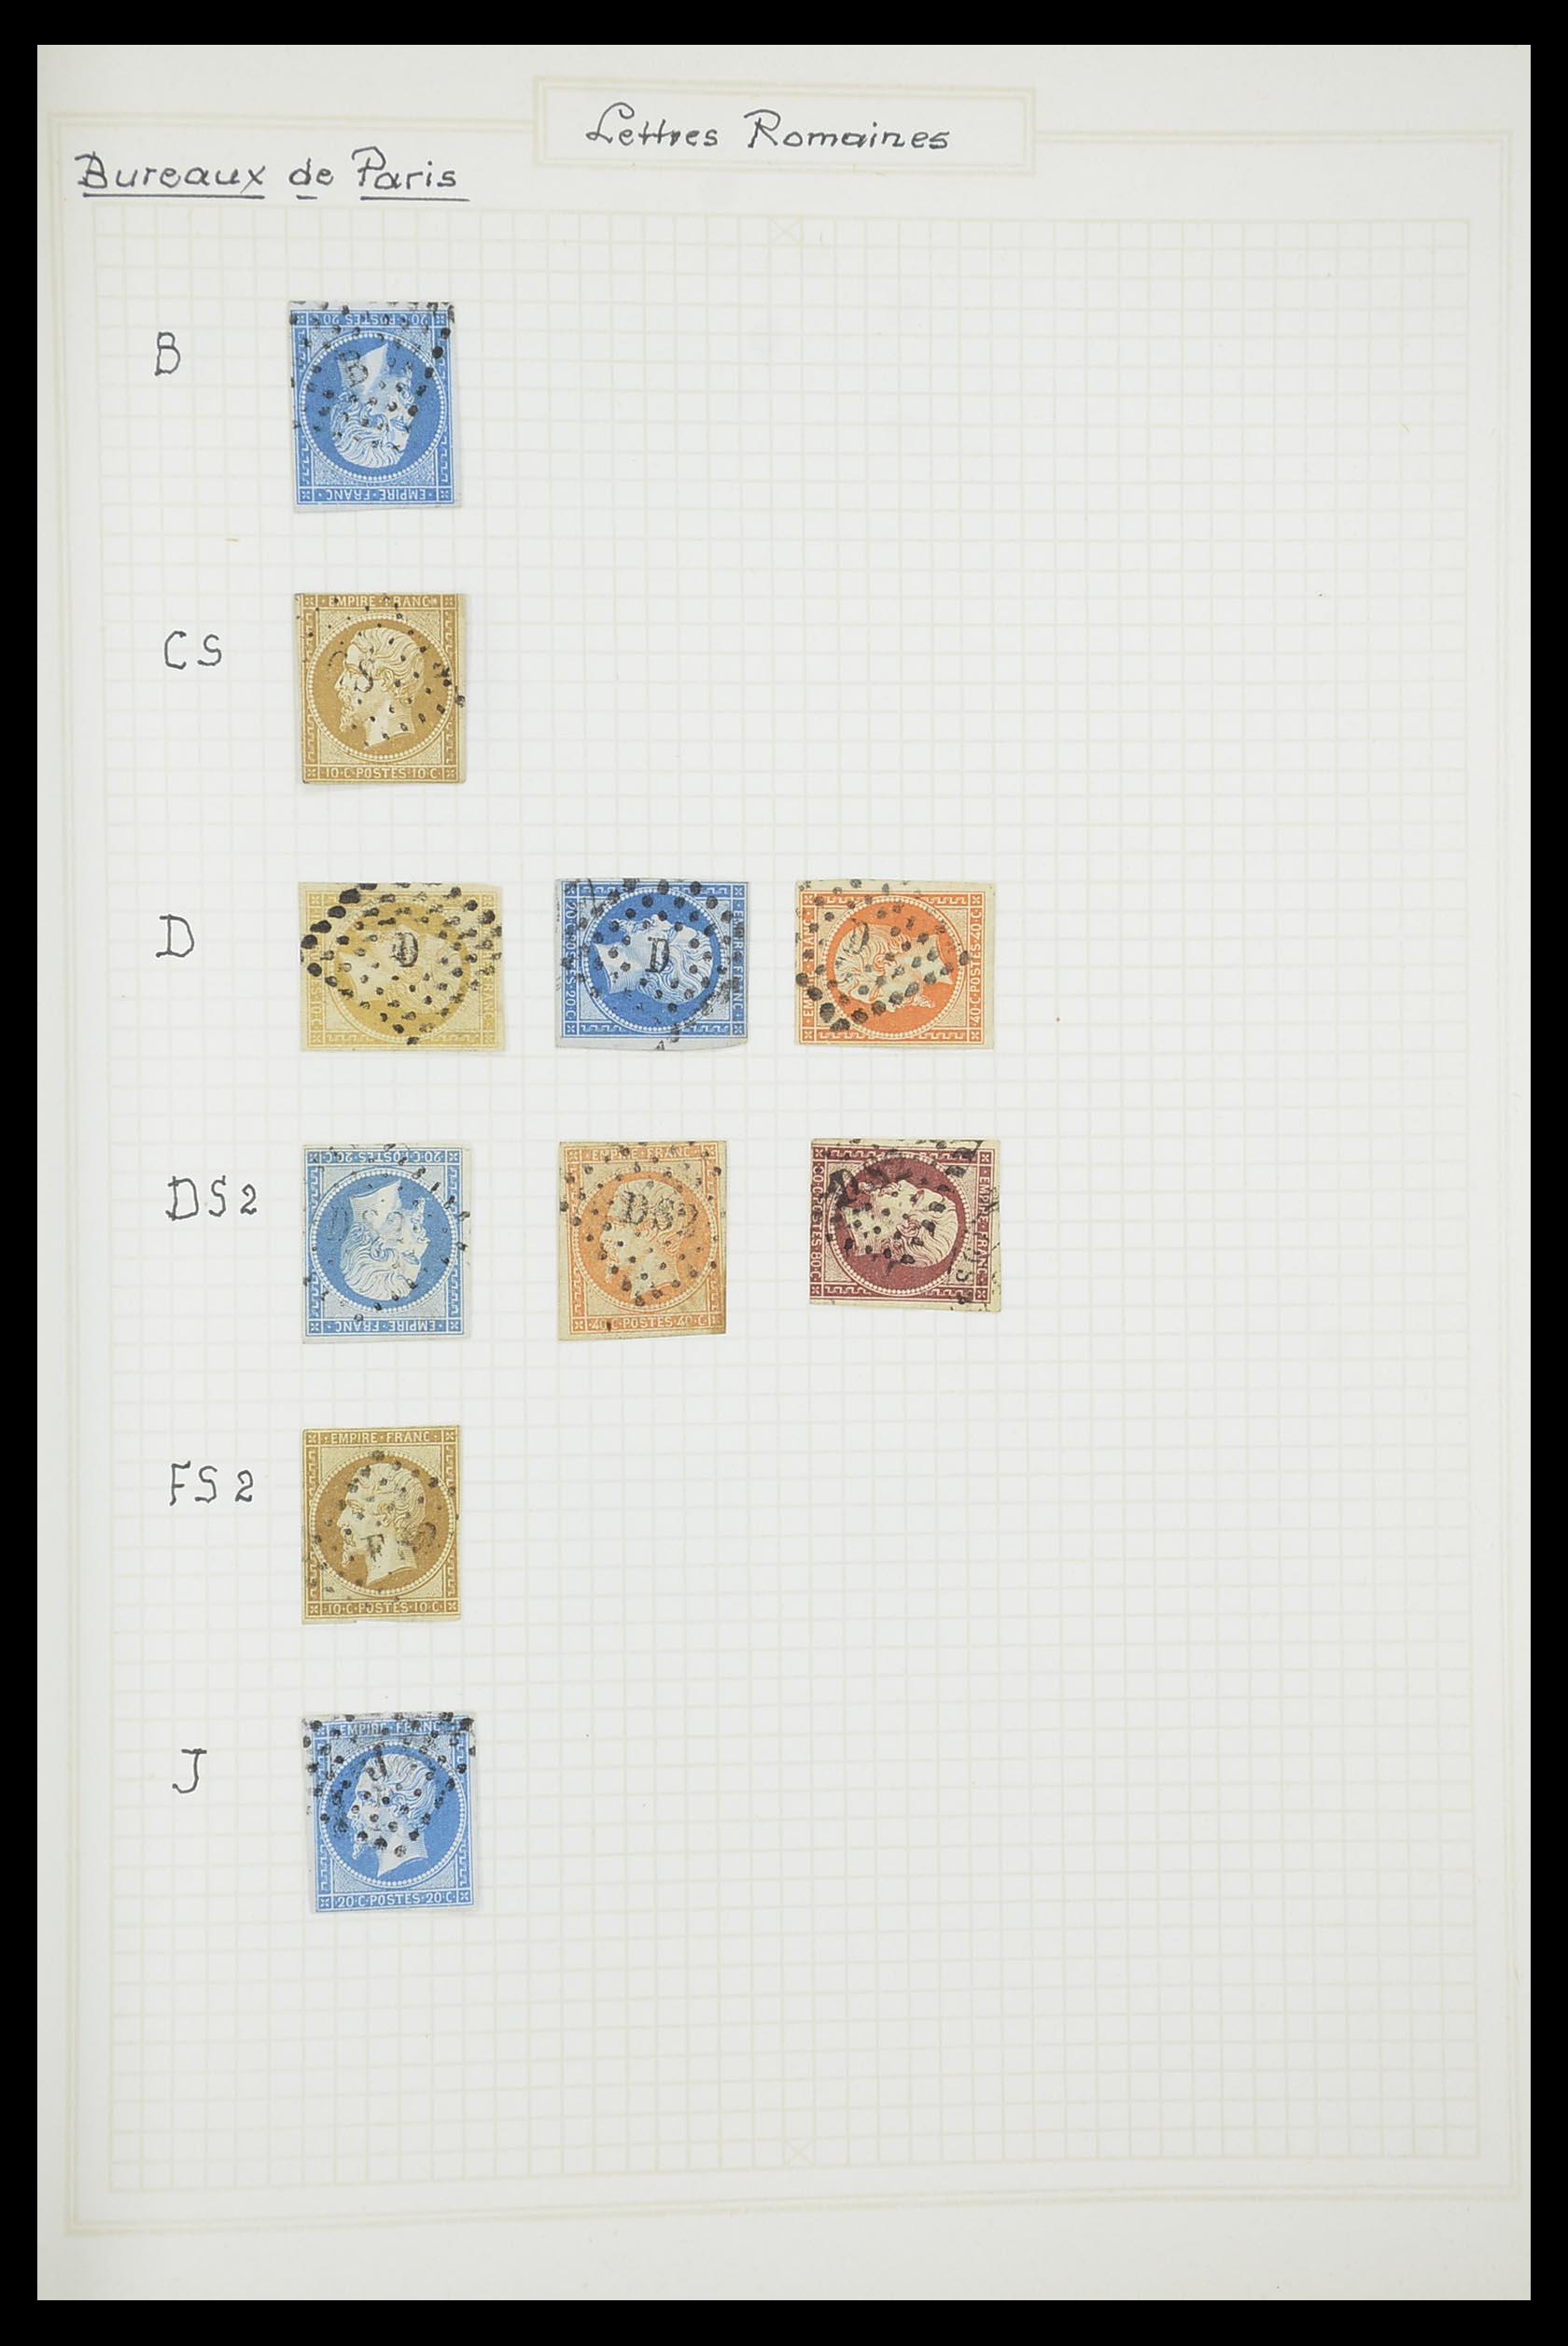 33851 015 - Postzegelverzameling 33851 Frankrijk klassiek stempels.